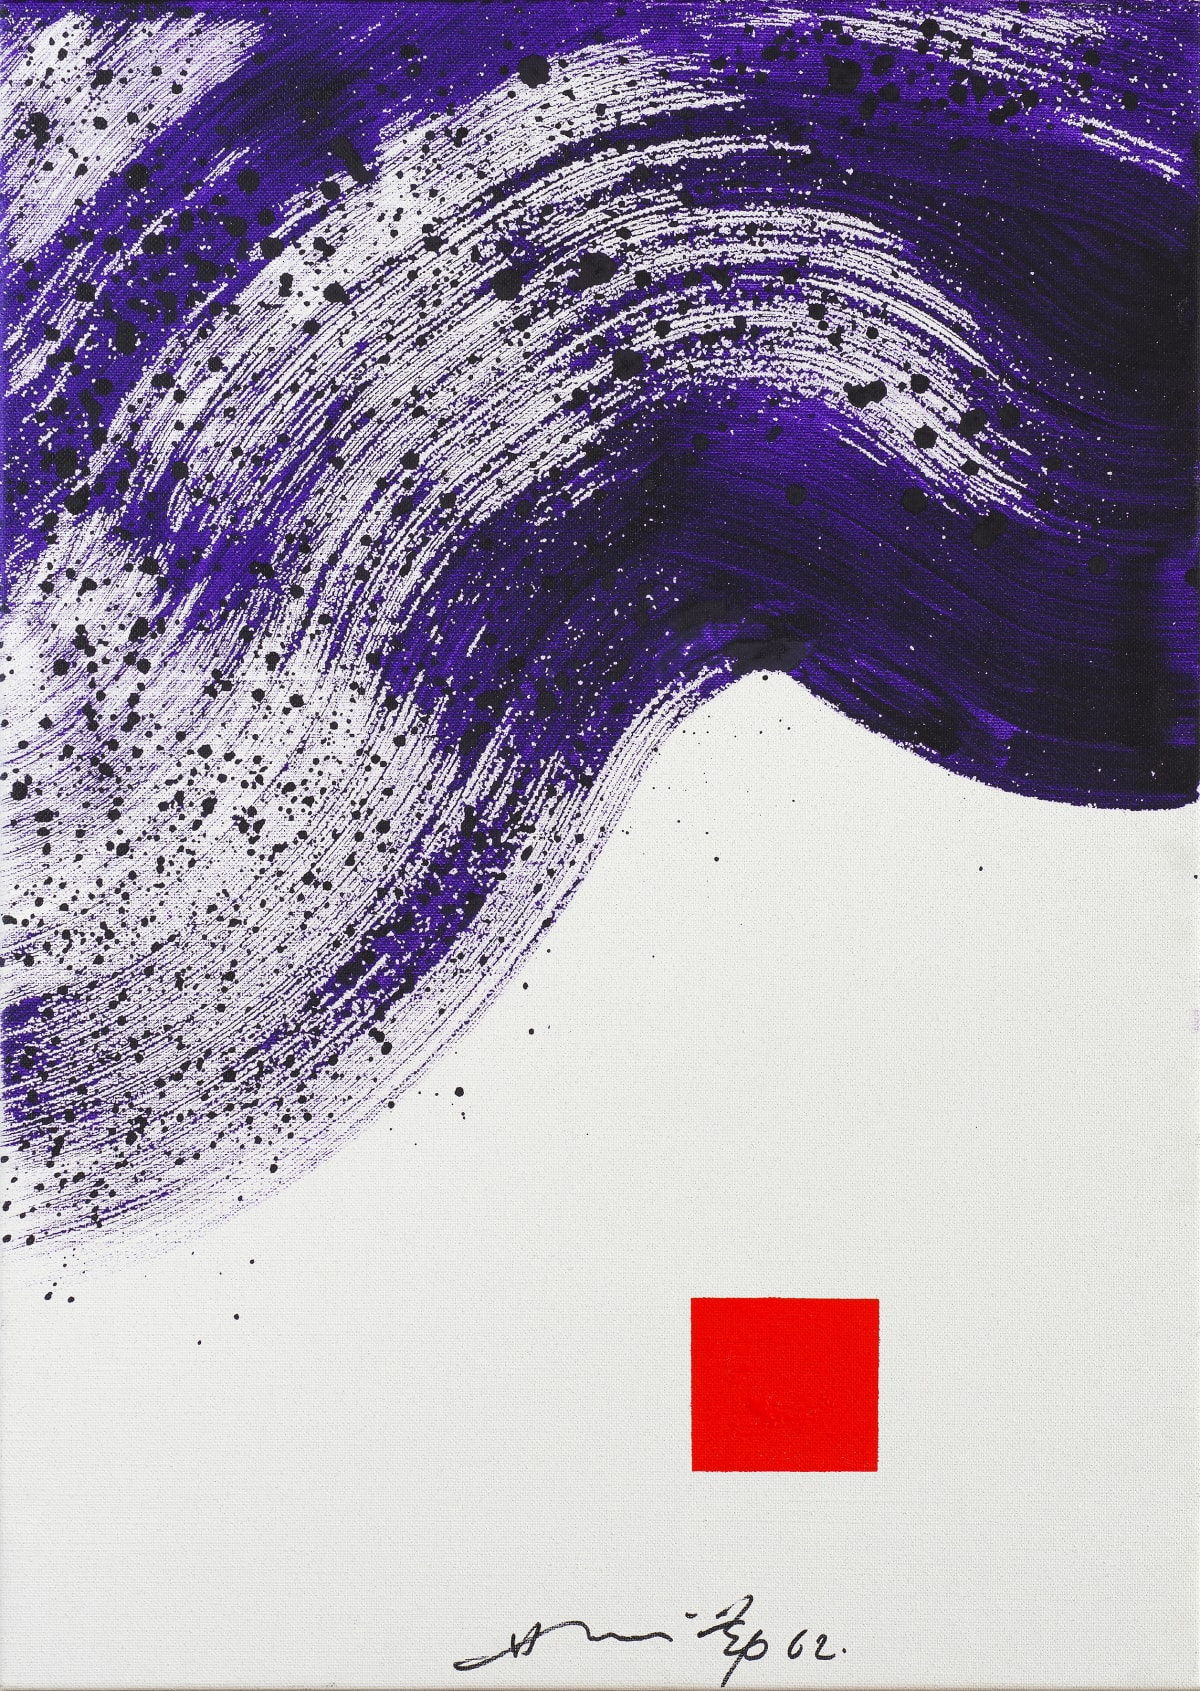 Hsiao Chin 蕭勤, The Beginning of Tao-2 (L'Inizio Del Tao-2) 道之始-2, 1962